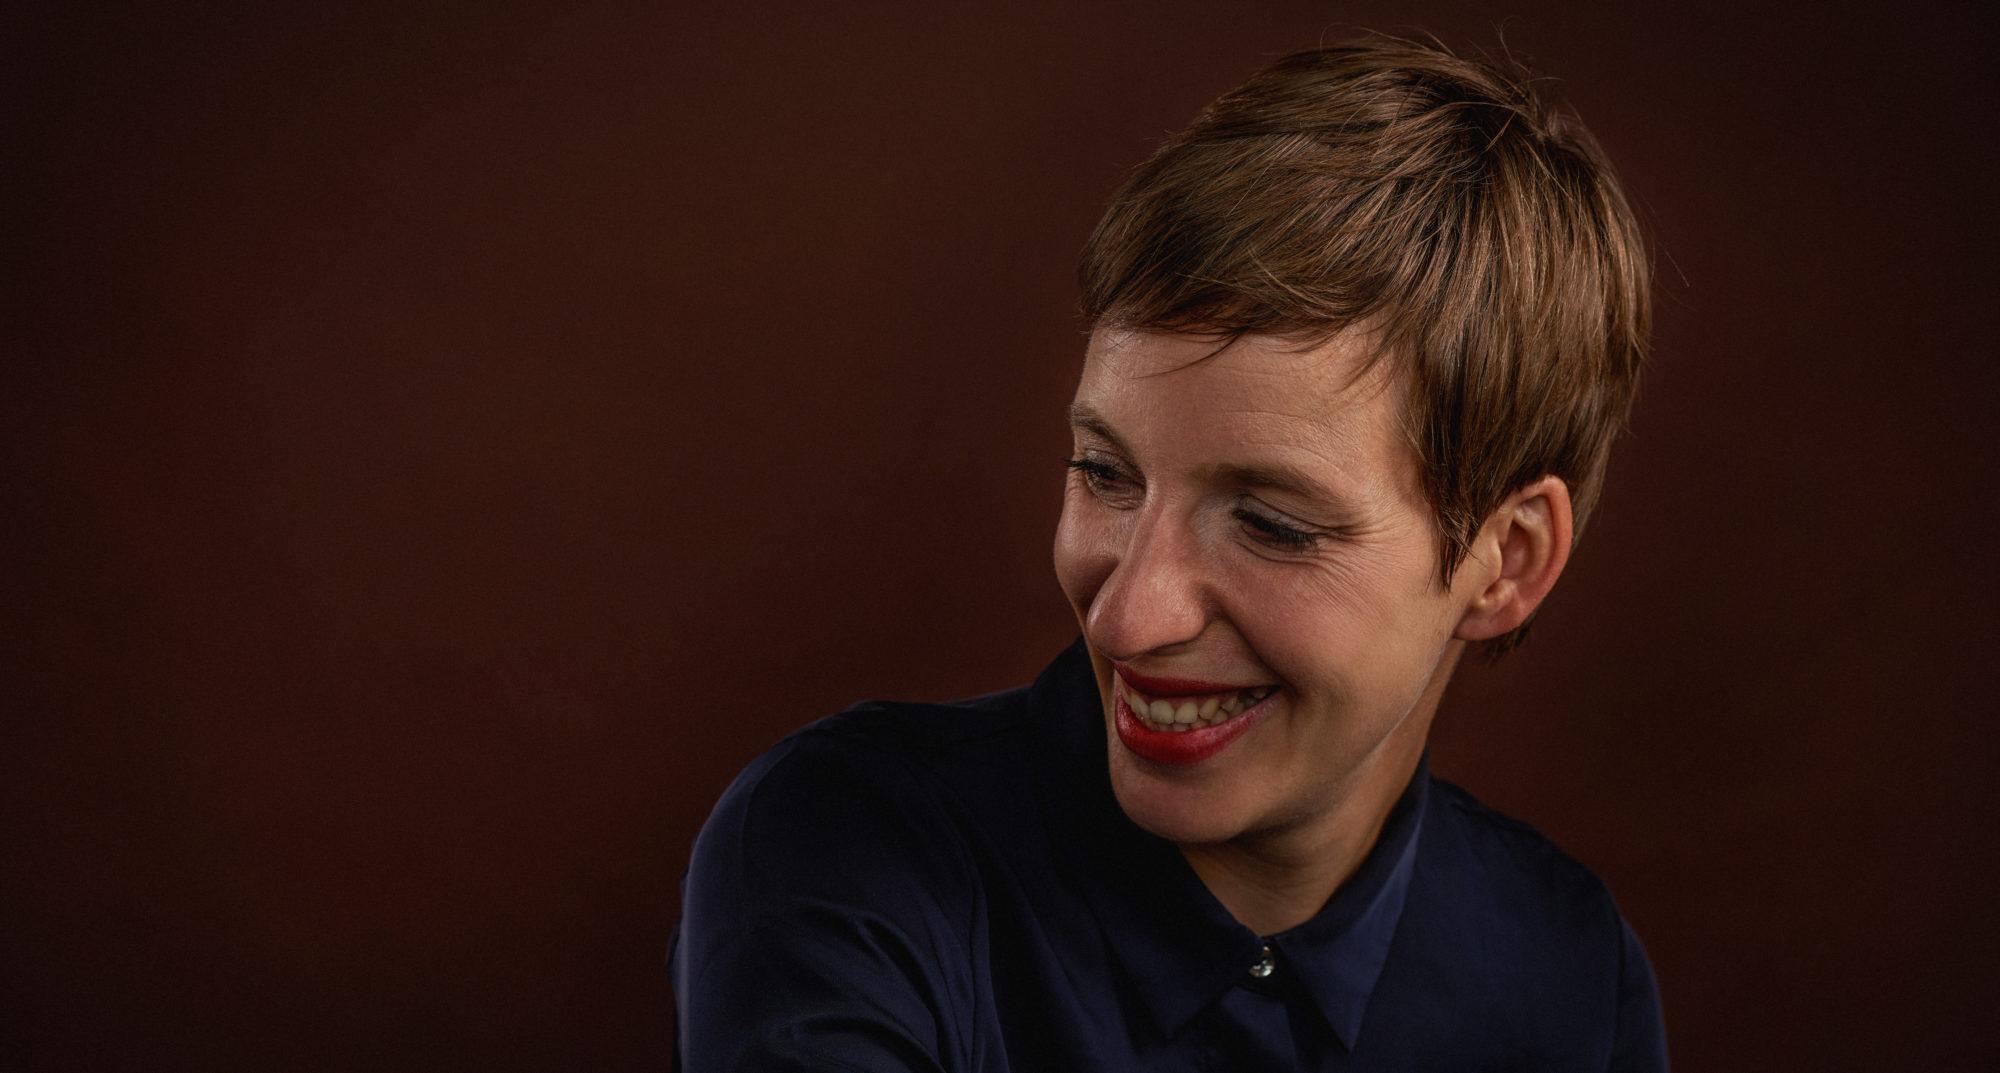 Lisa Hasler